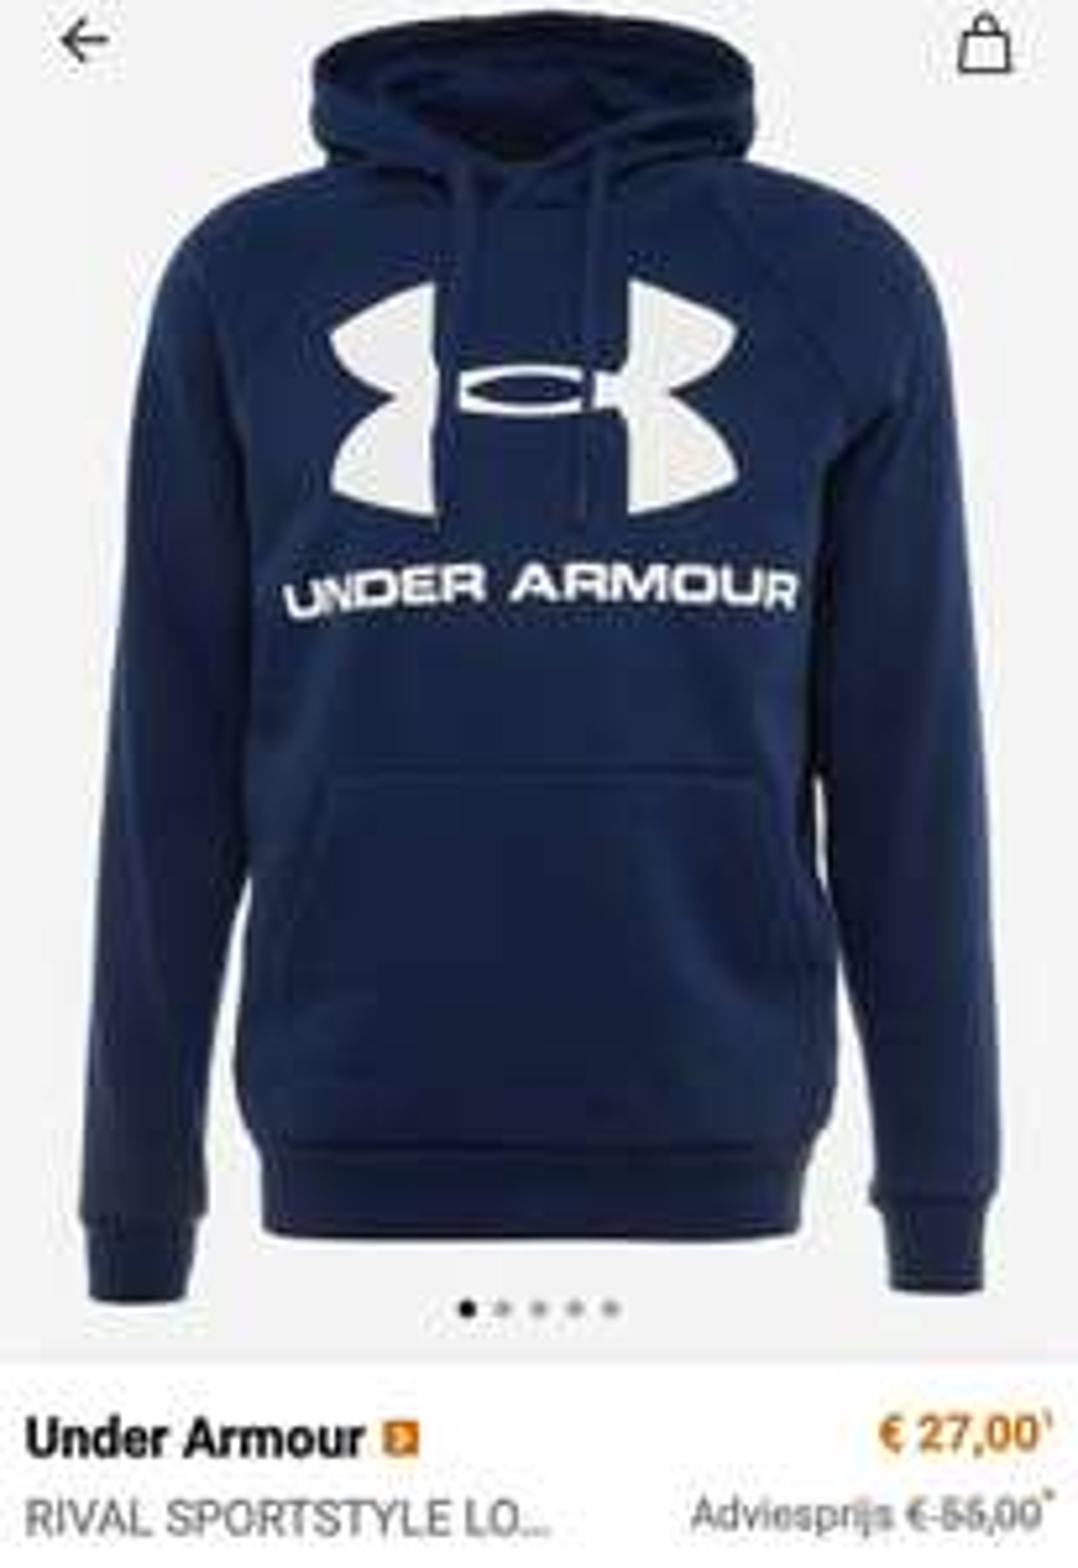 Under Armour kleding + schoenen voor mannen, vrouwen & kids